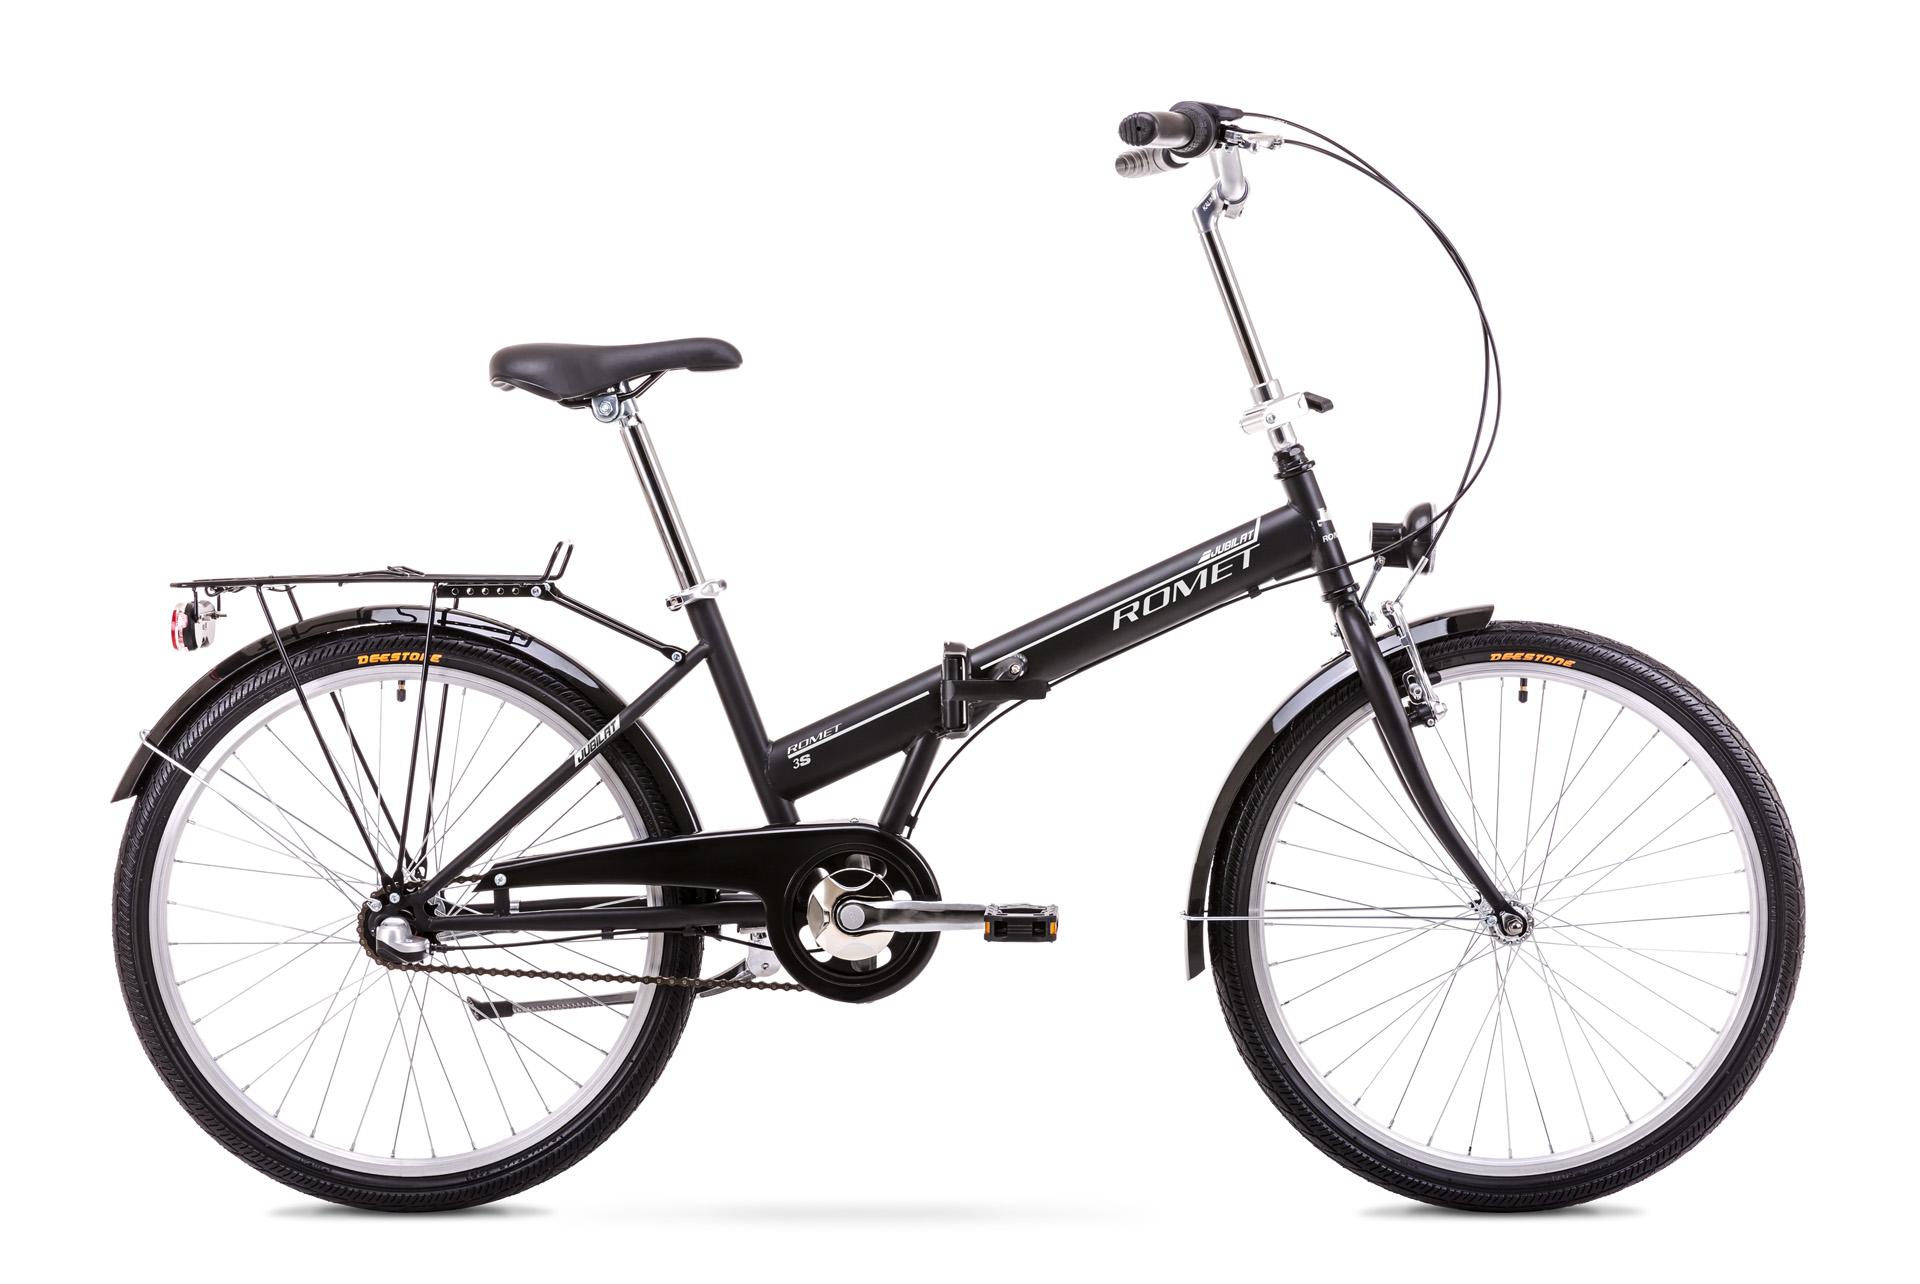 Bicicleta pliabila Unisex Romet Jubilat 2 Negru/Alb 2019 imagine